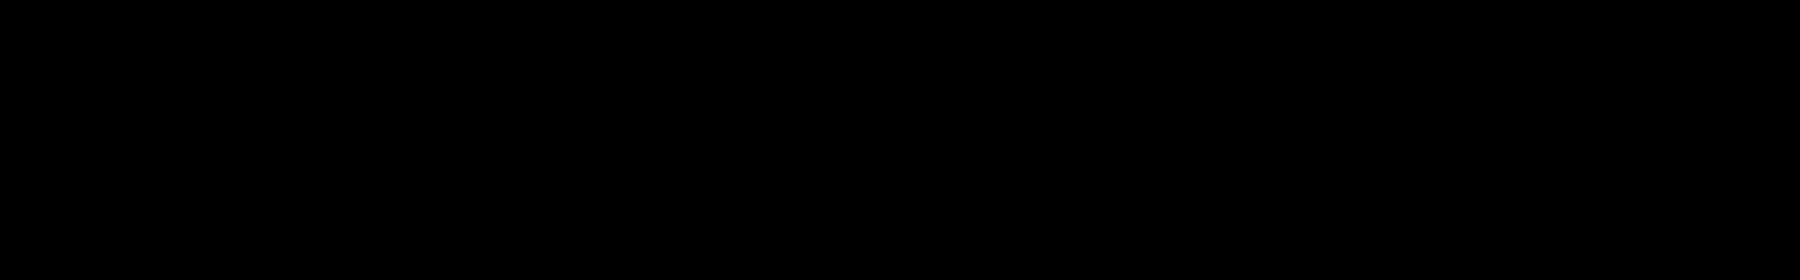 Space Raver audio waveform